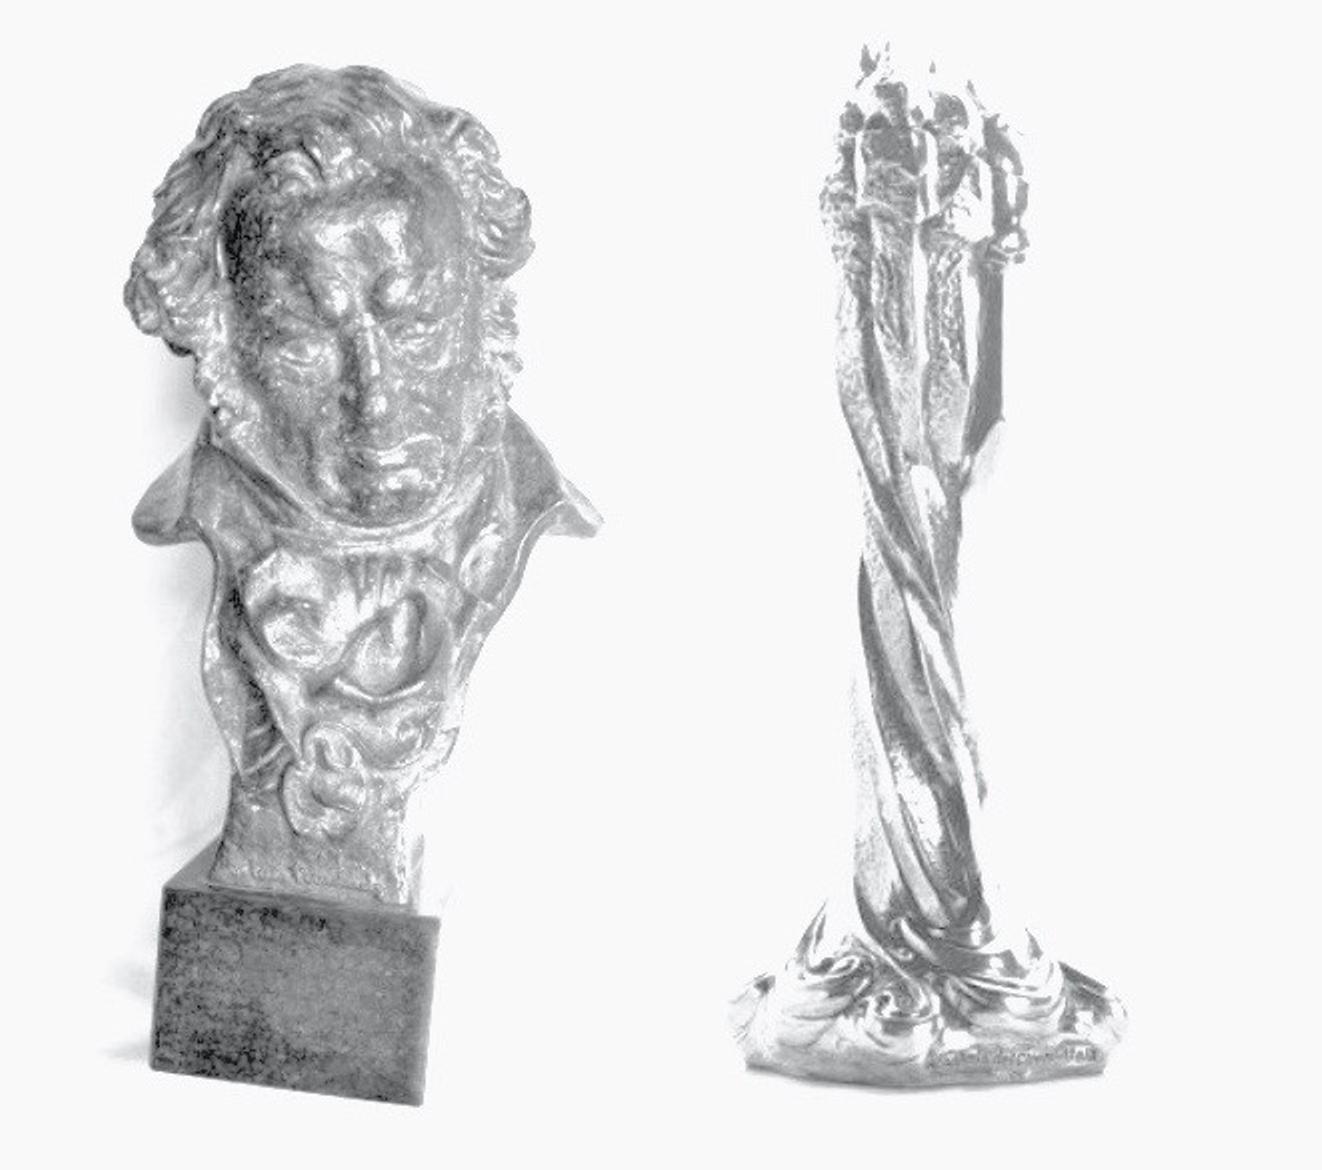 Els premis Goya i Gaudi